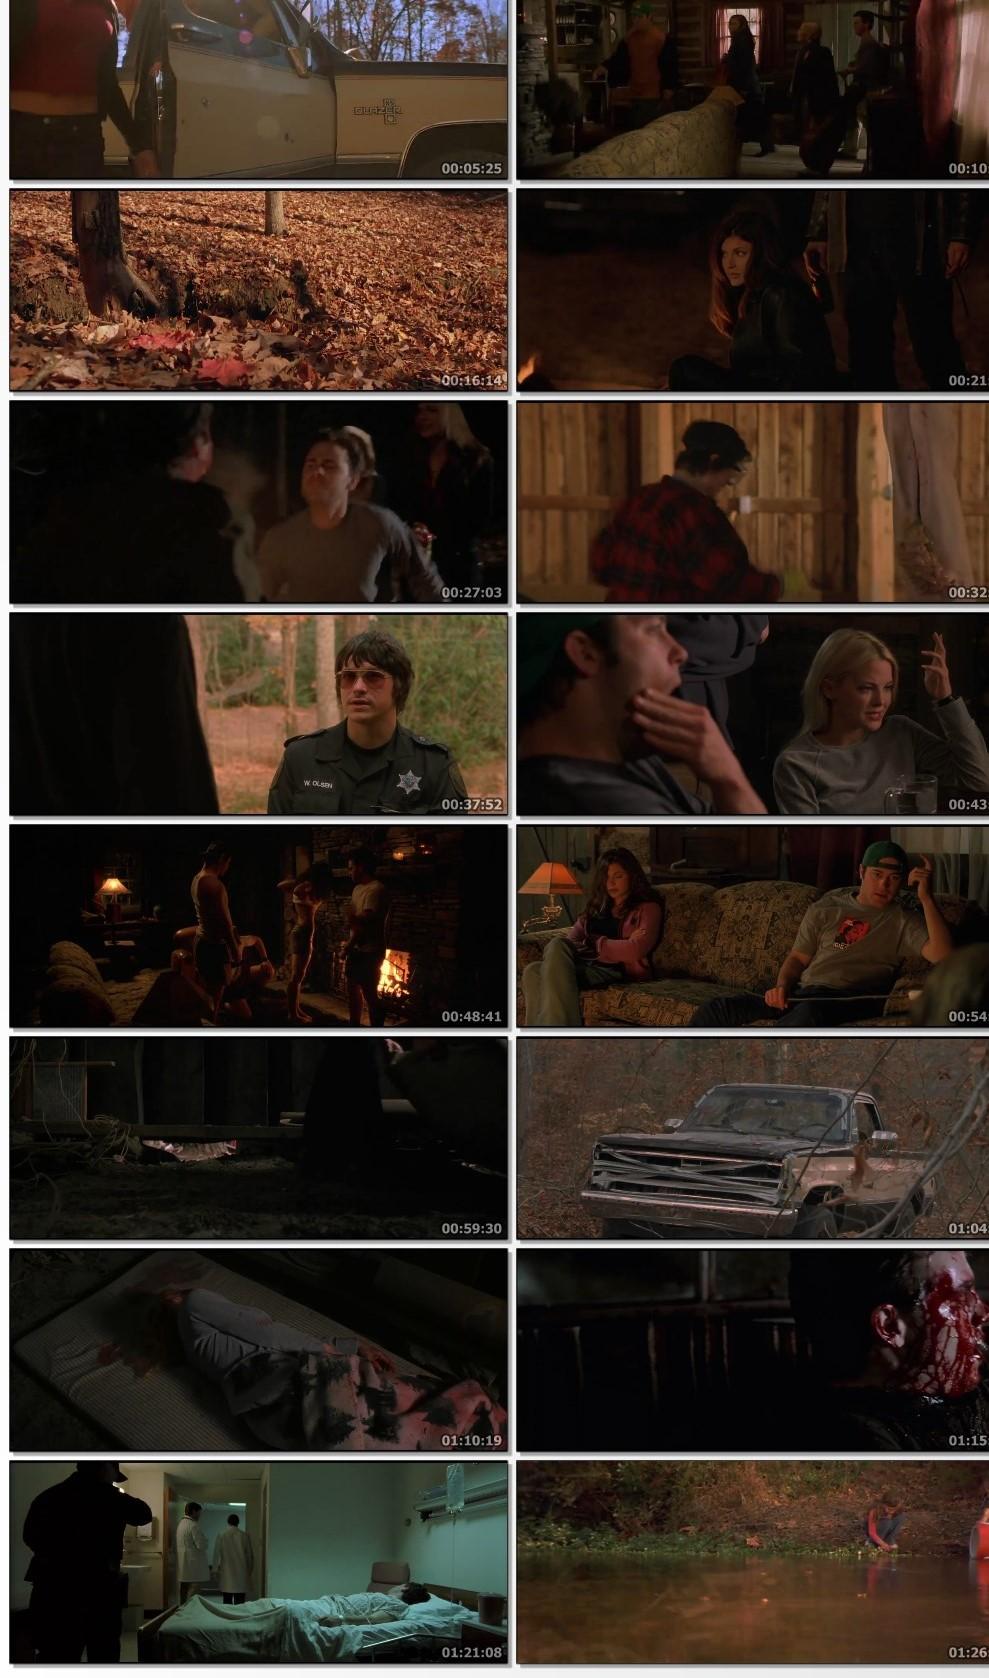 Cabin-Fever-2003-www-9kmovies-ink-Hindi-ORG-Dual-Audio-720p-Blu-Ray-ESub-700-MB-mkv-thumbs1c6fc725ef